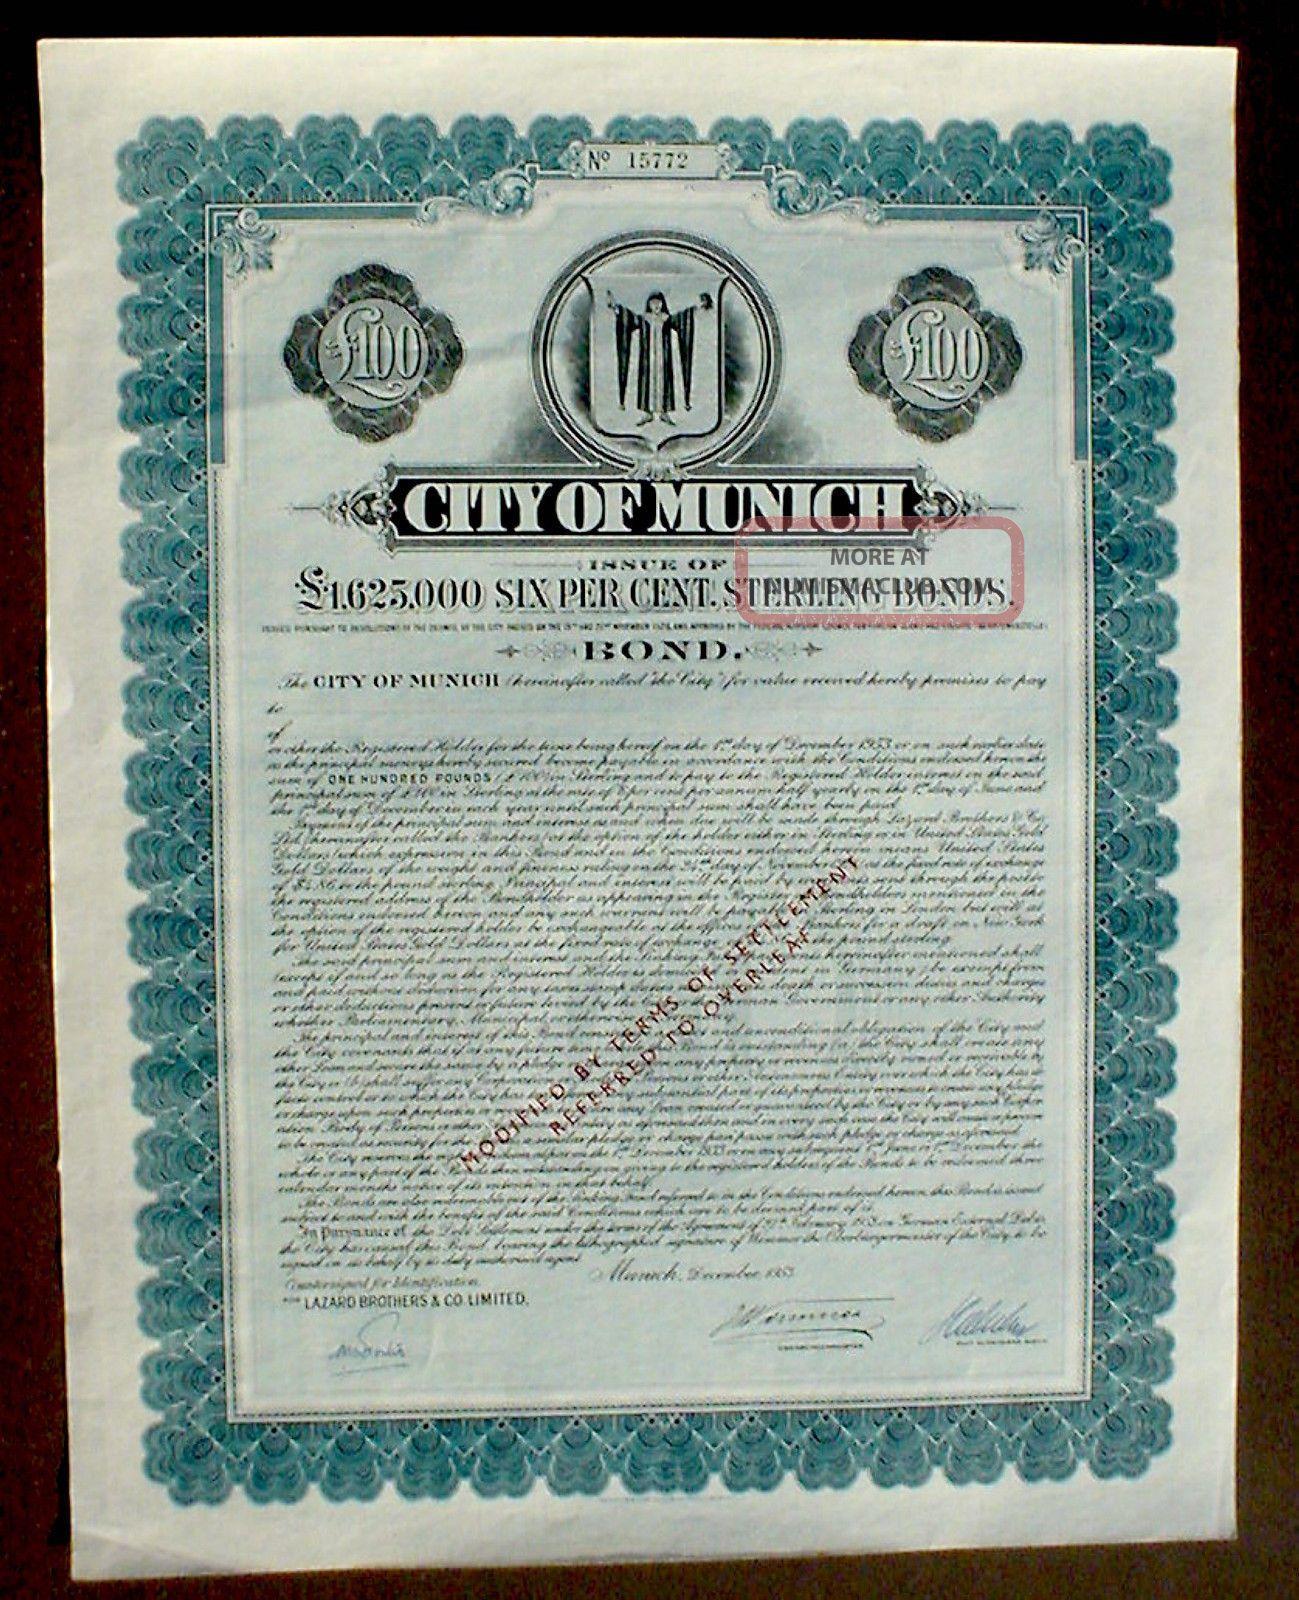 German Government 6 Bond City Of Munich 100 Pound Sterling 1953 Uncancelled Stocks & Bonds, Scripophily photo